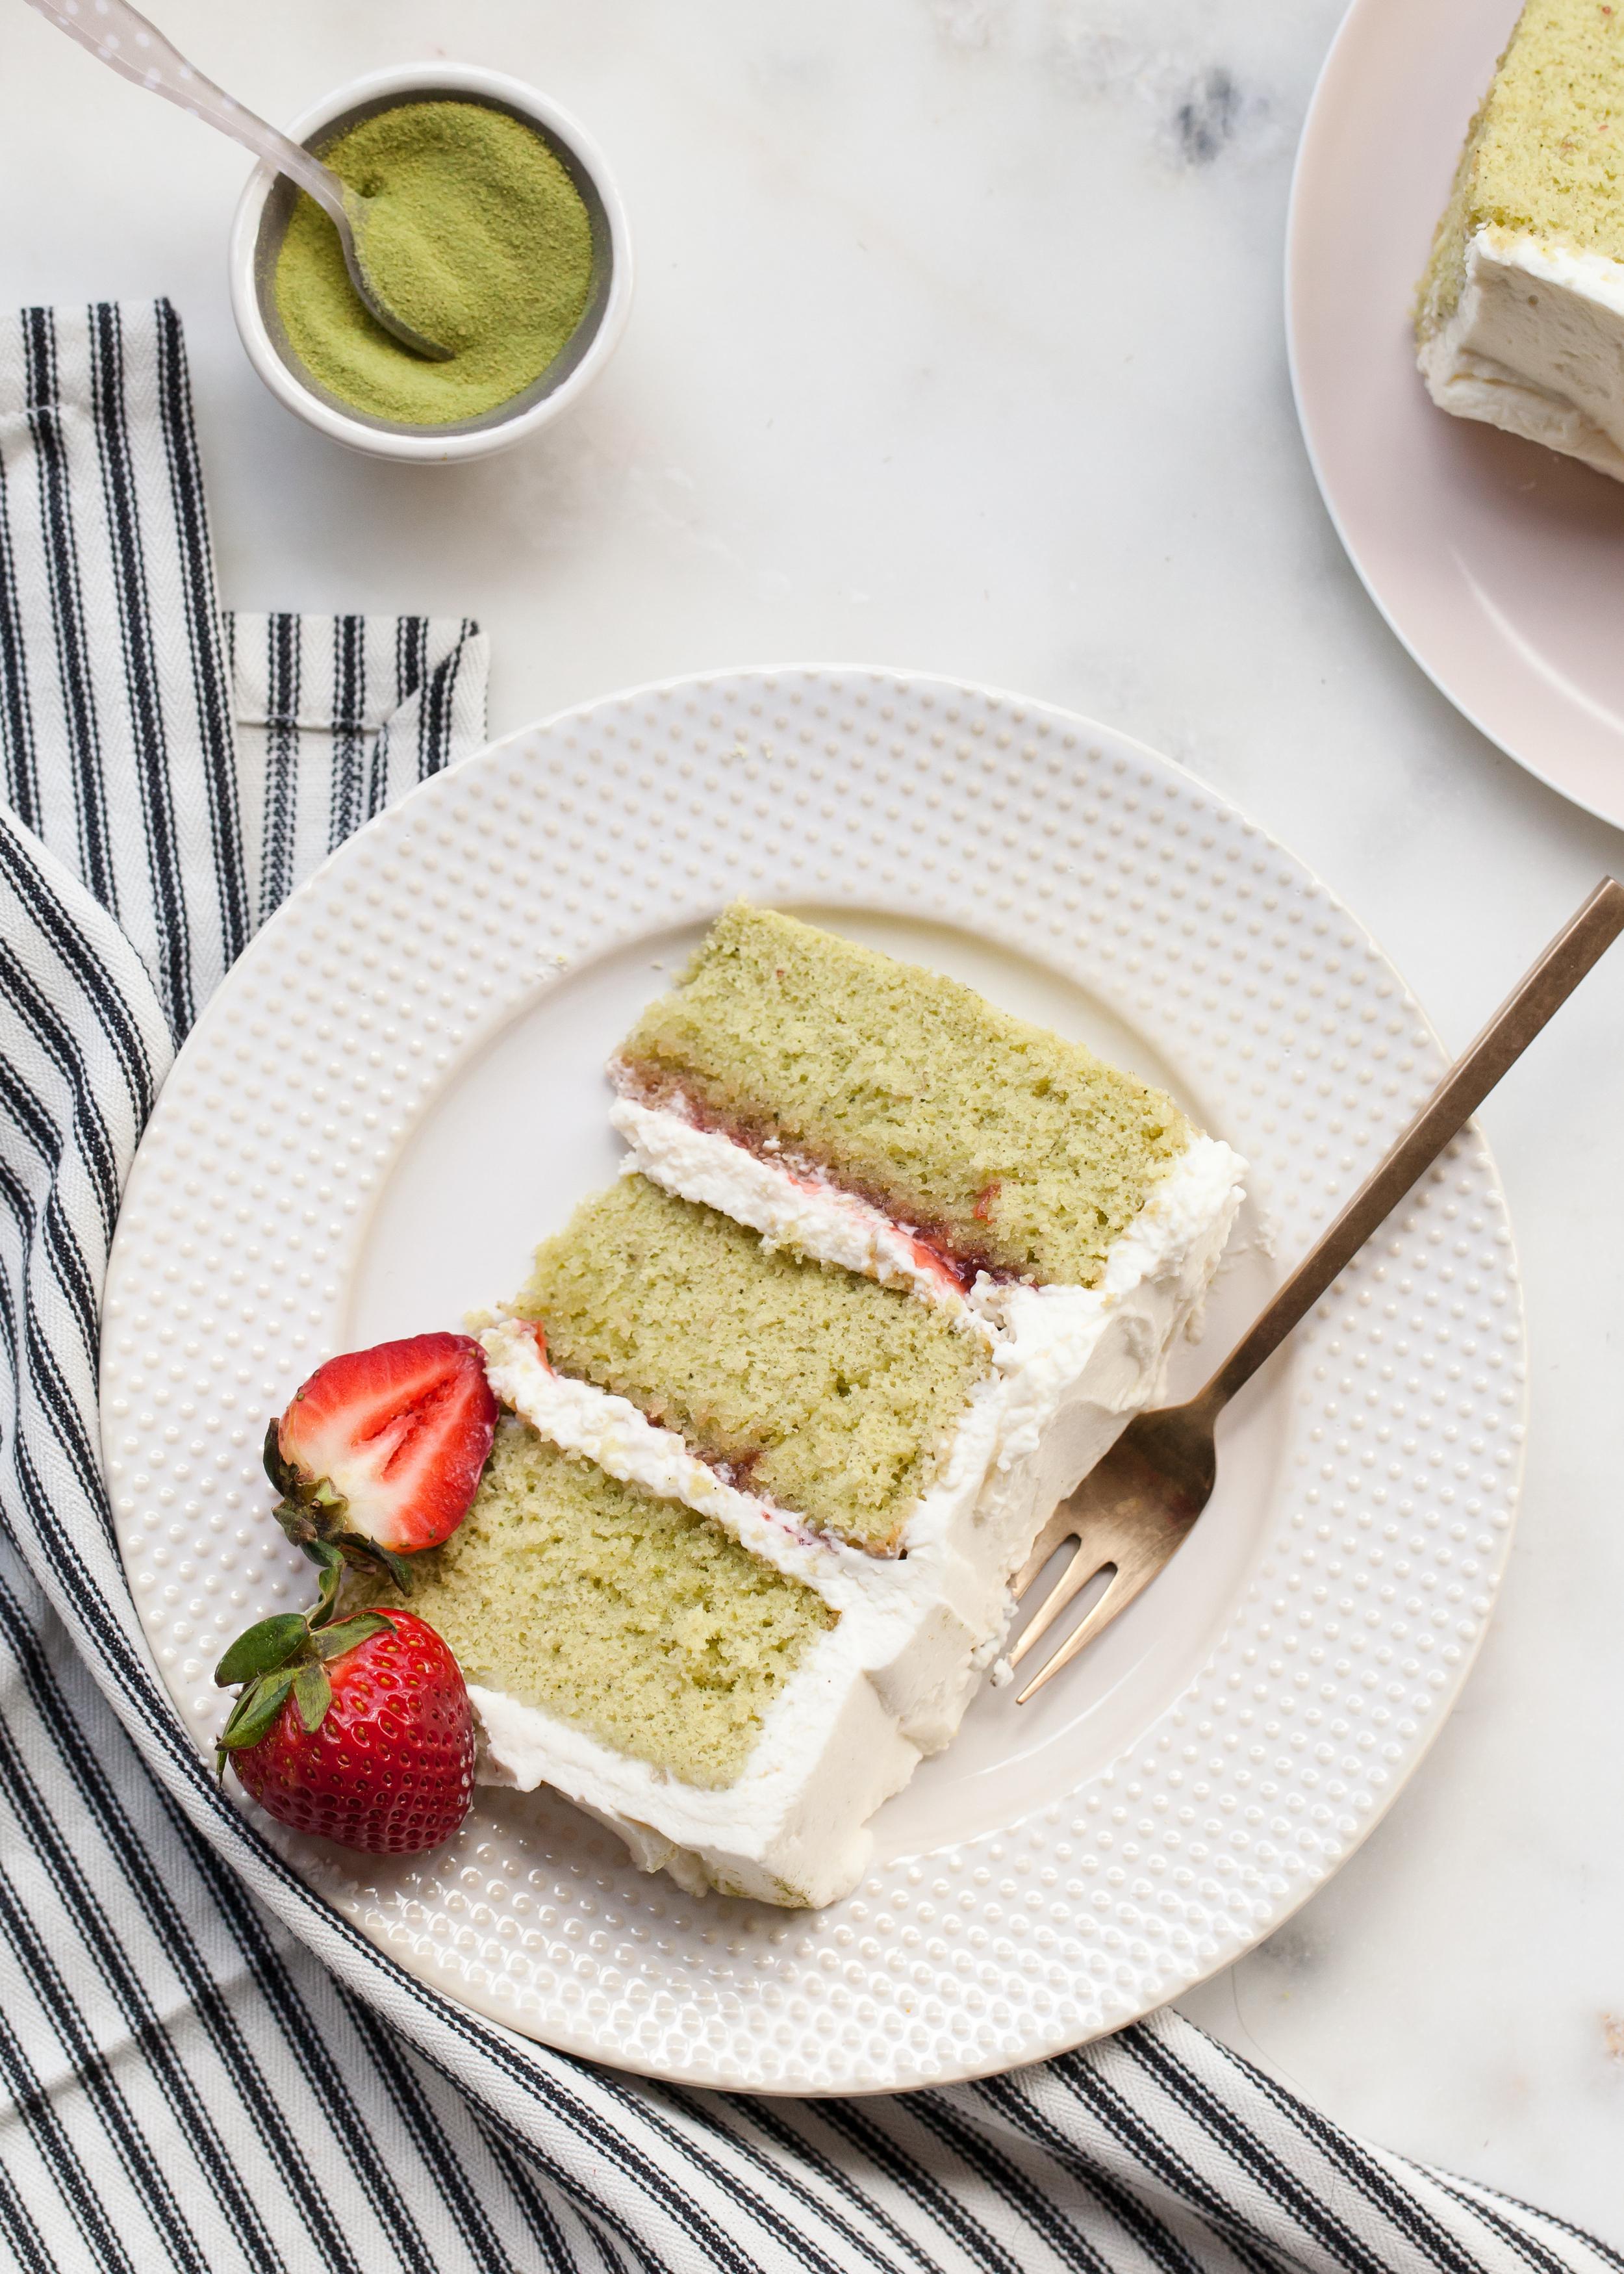 Matcha (green tea) genoise cake with strawberries and cream cheese whipped cream.